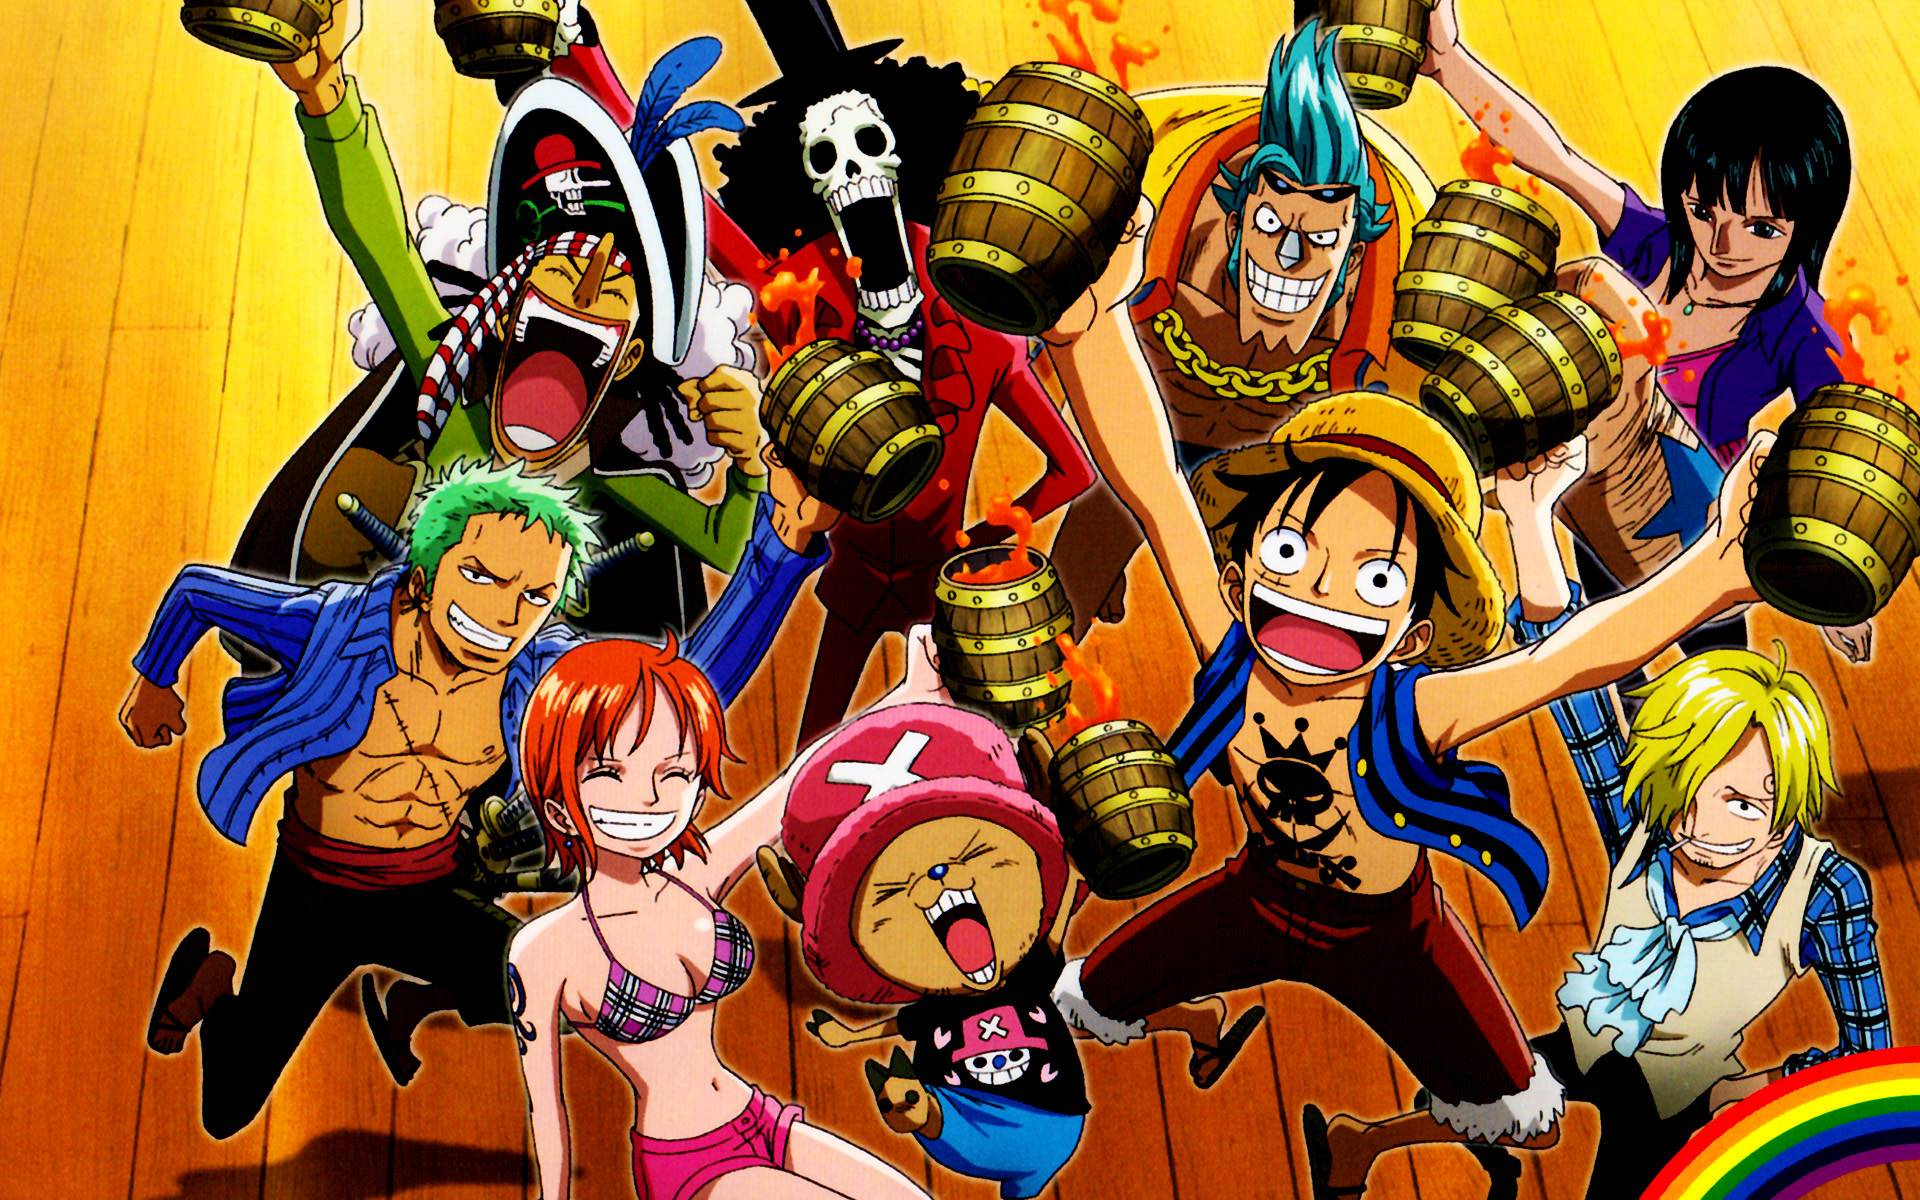 Download One Piece Computer Wallpaper Gallery